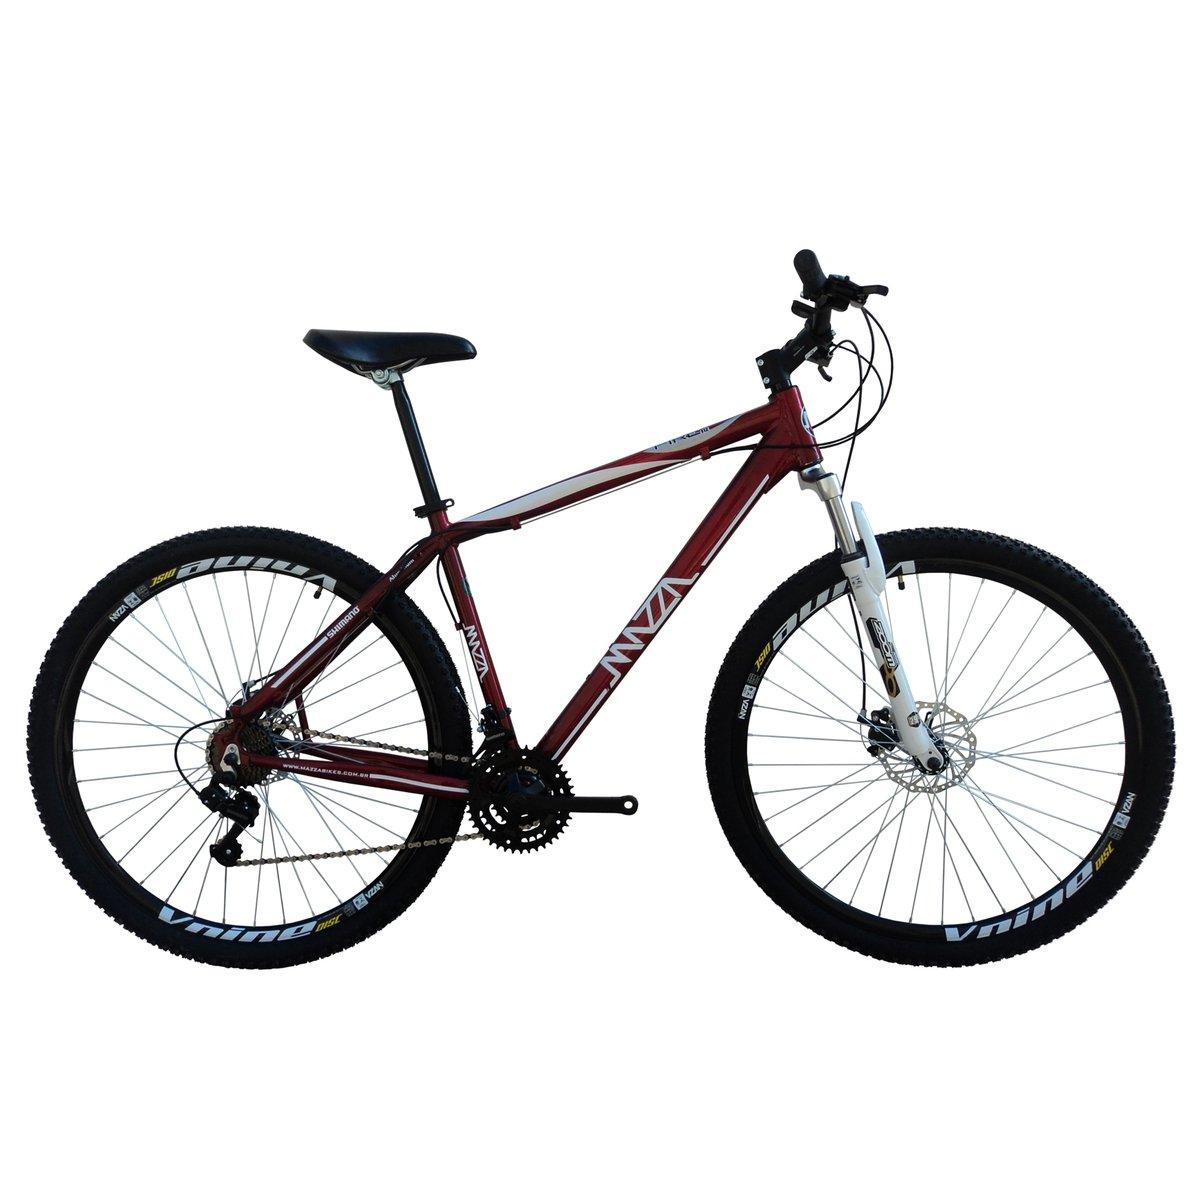 Bicicleta Mazza Bikes Fire 112 - Aro 29 - Altus 24 Marchas HID - Compre  Agora  a399a75d2f0d8